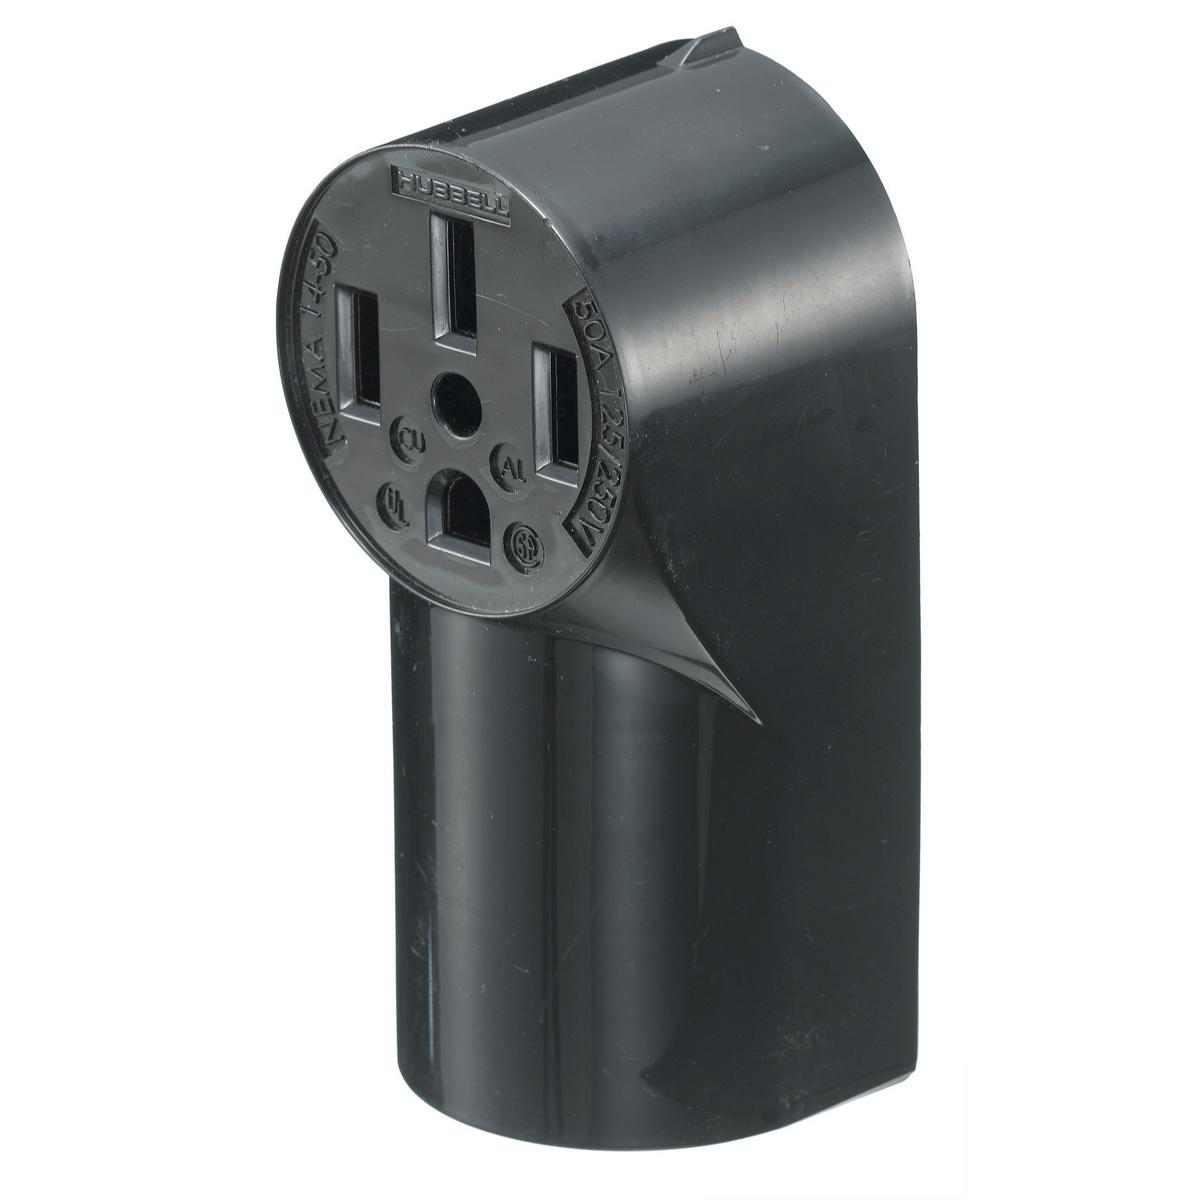 Hubbell RR450 50 Amp 125/250 Volt 3-Pole 4-Wire NEMA 14-50R Black Range and Dryer Power Receptacle